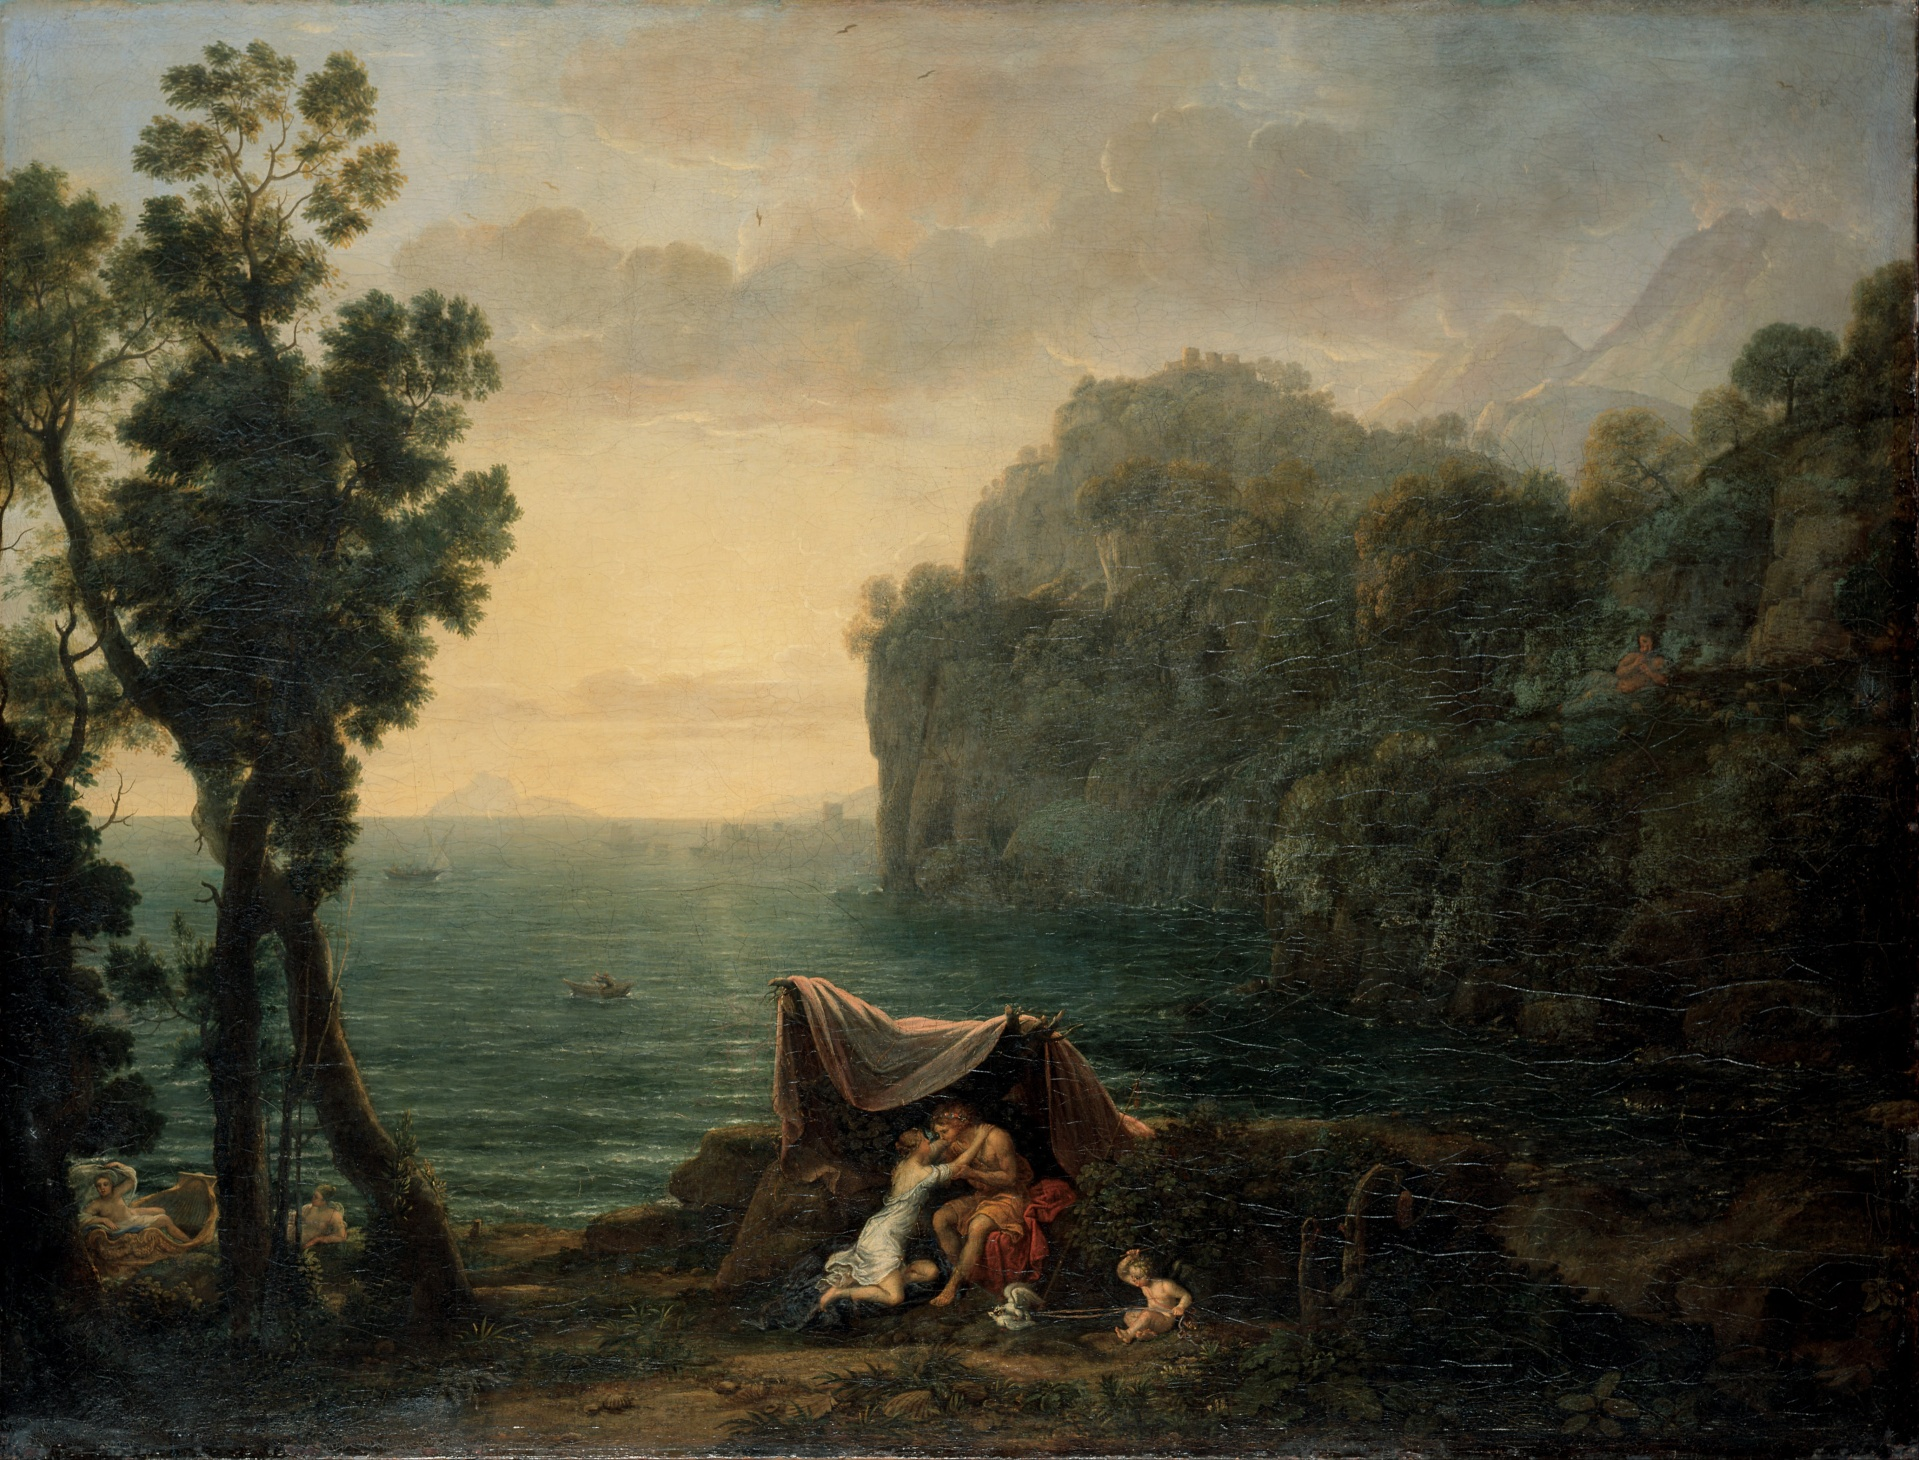 Claude_Lorrain_-_Landscape_with_Acis_and_Galatea_-_Google_Art_Project